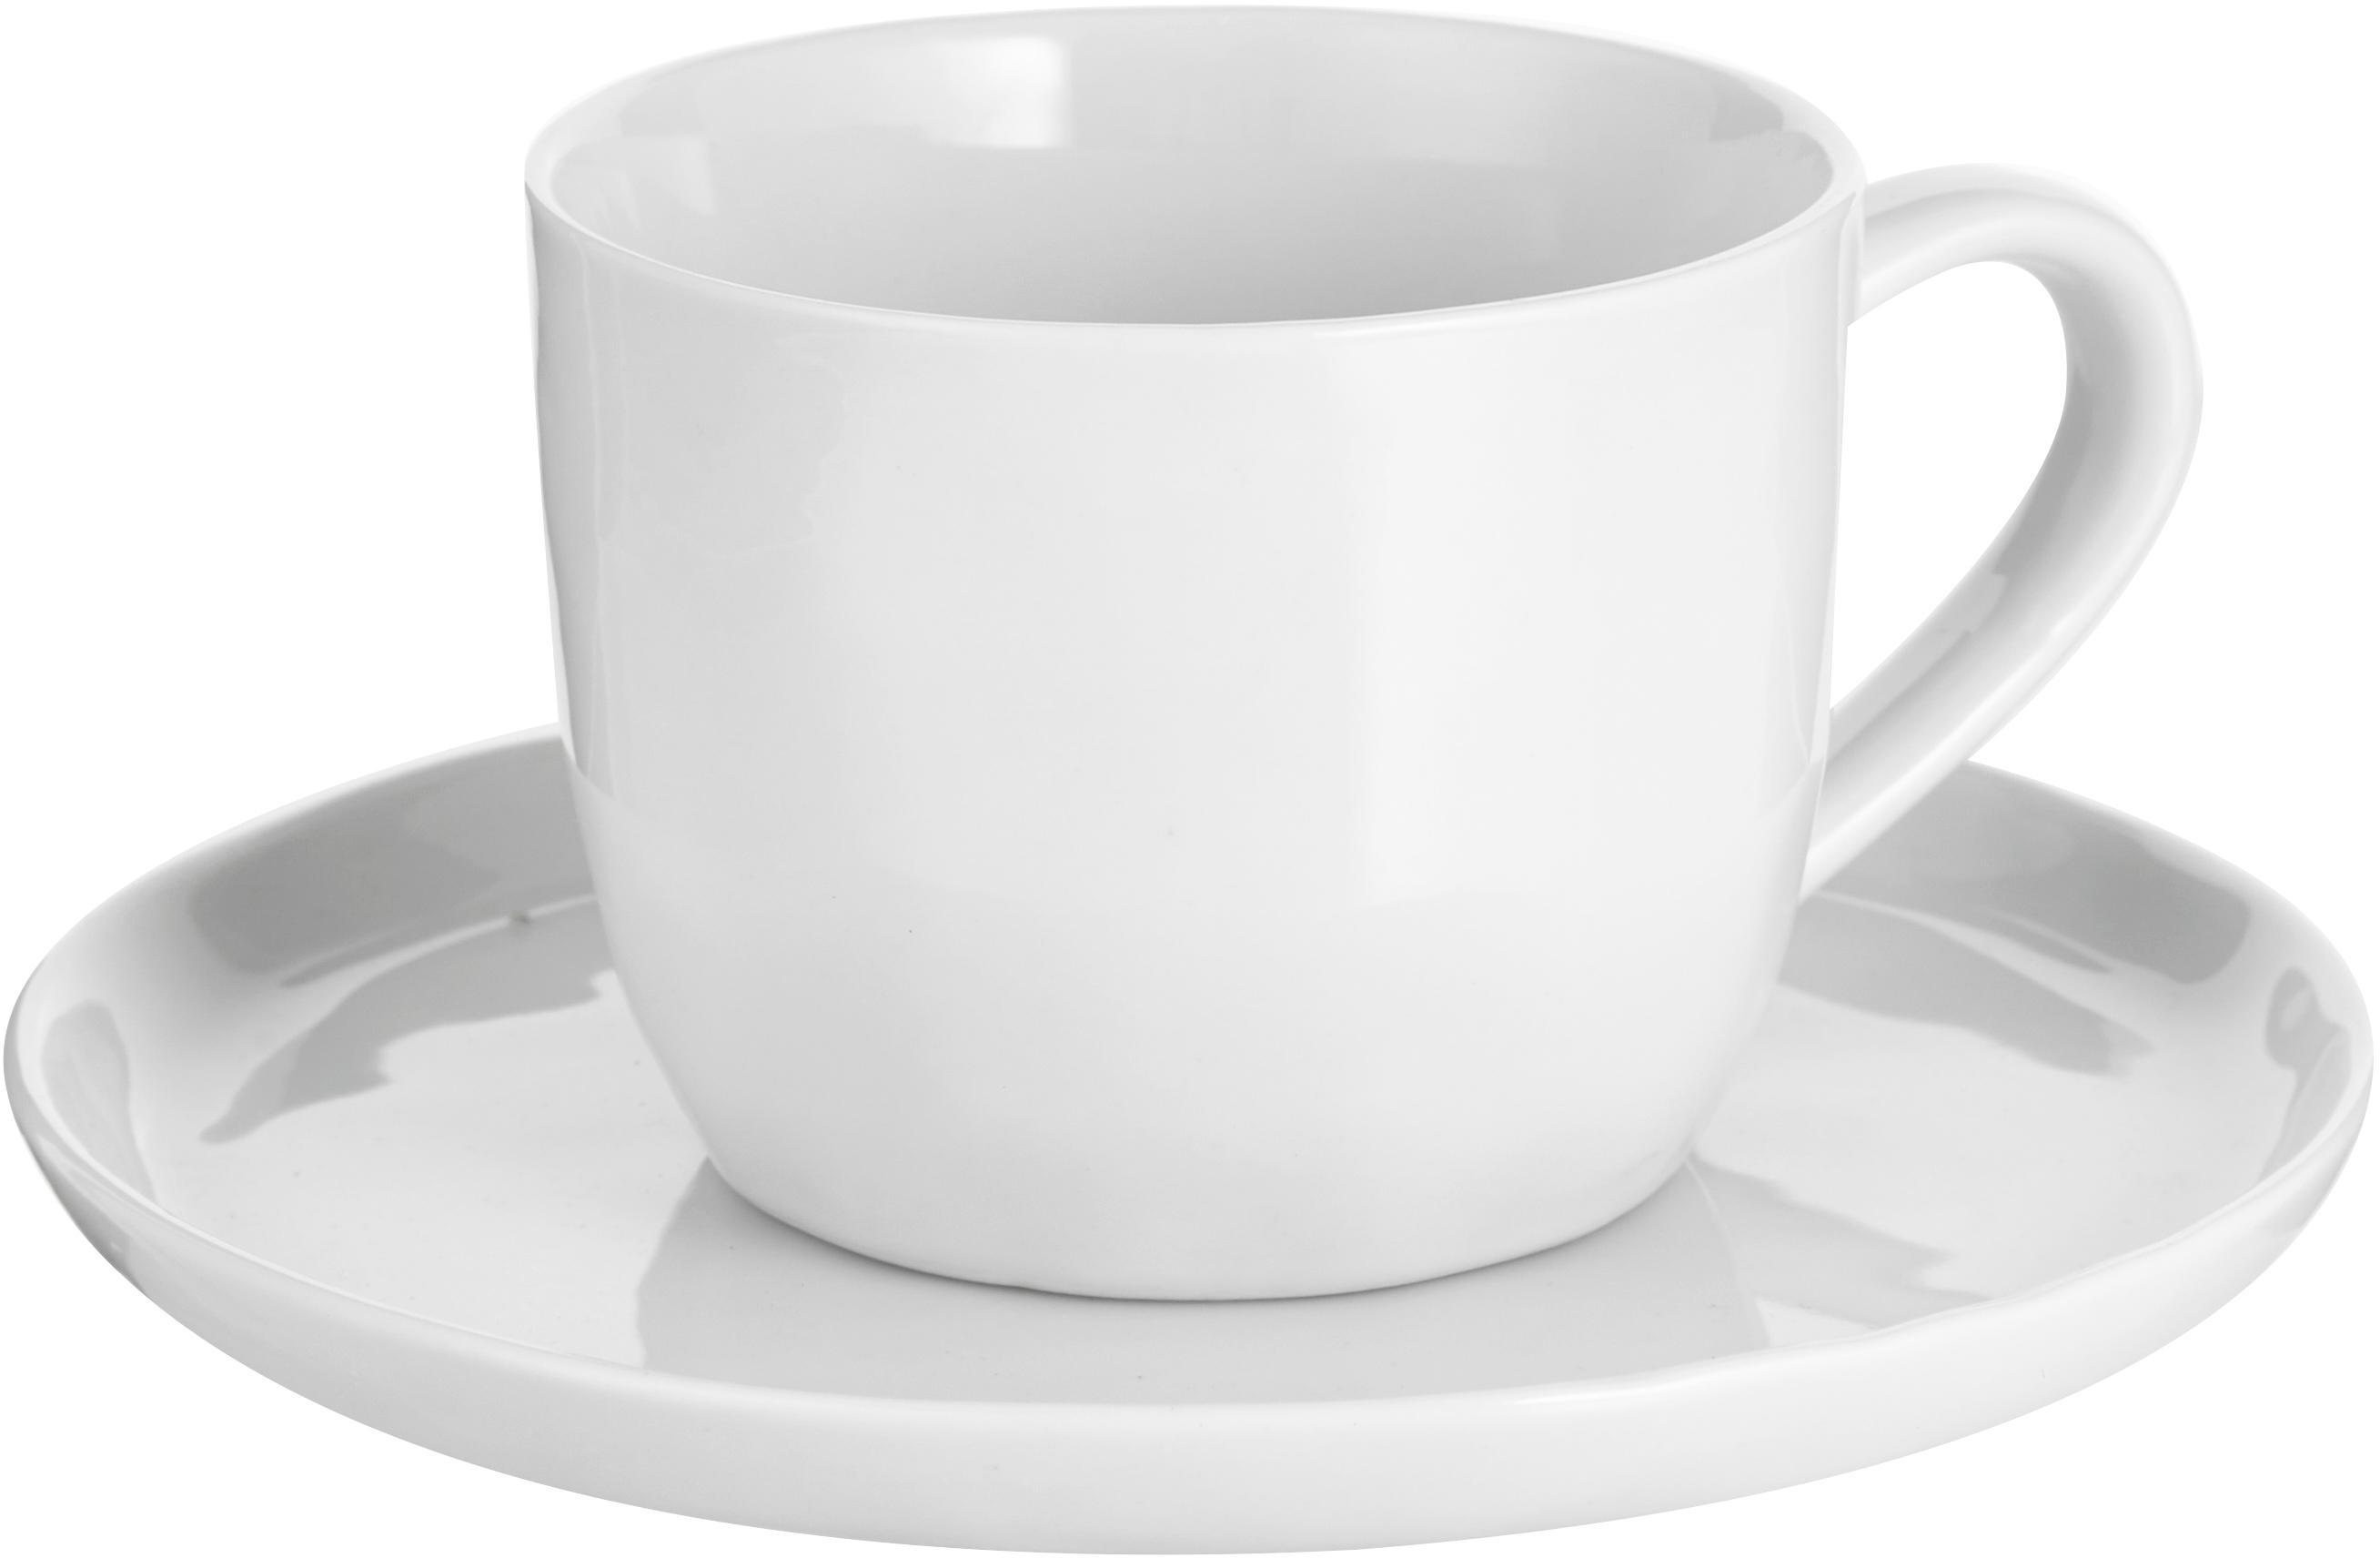 Set tazze in porcellana Porcelino 12 pz, Porcellana, volutamente irregolare, Bianco, Ø 15 x Alt. 8 cm